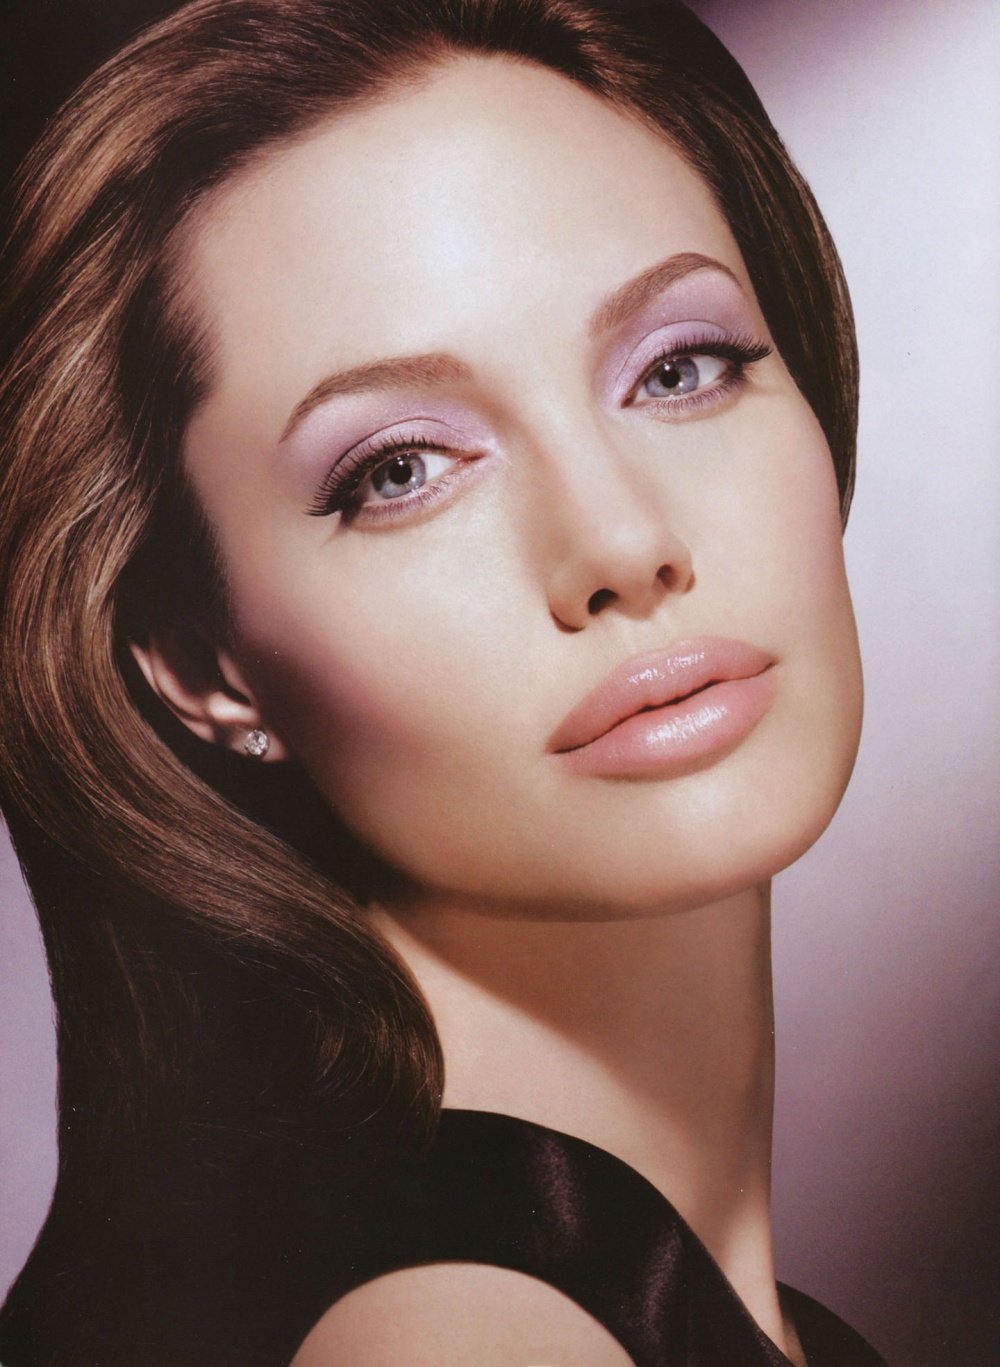 Фото: Анджелина Джоли анджелина джоли кинопоиск